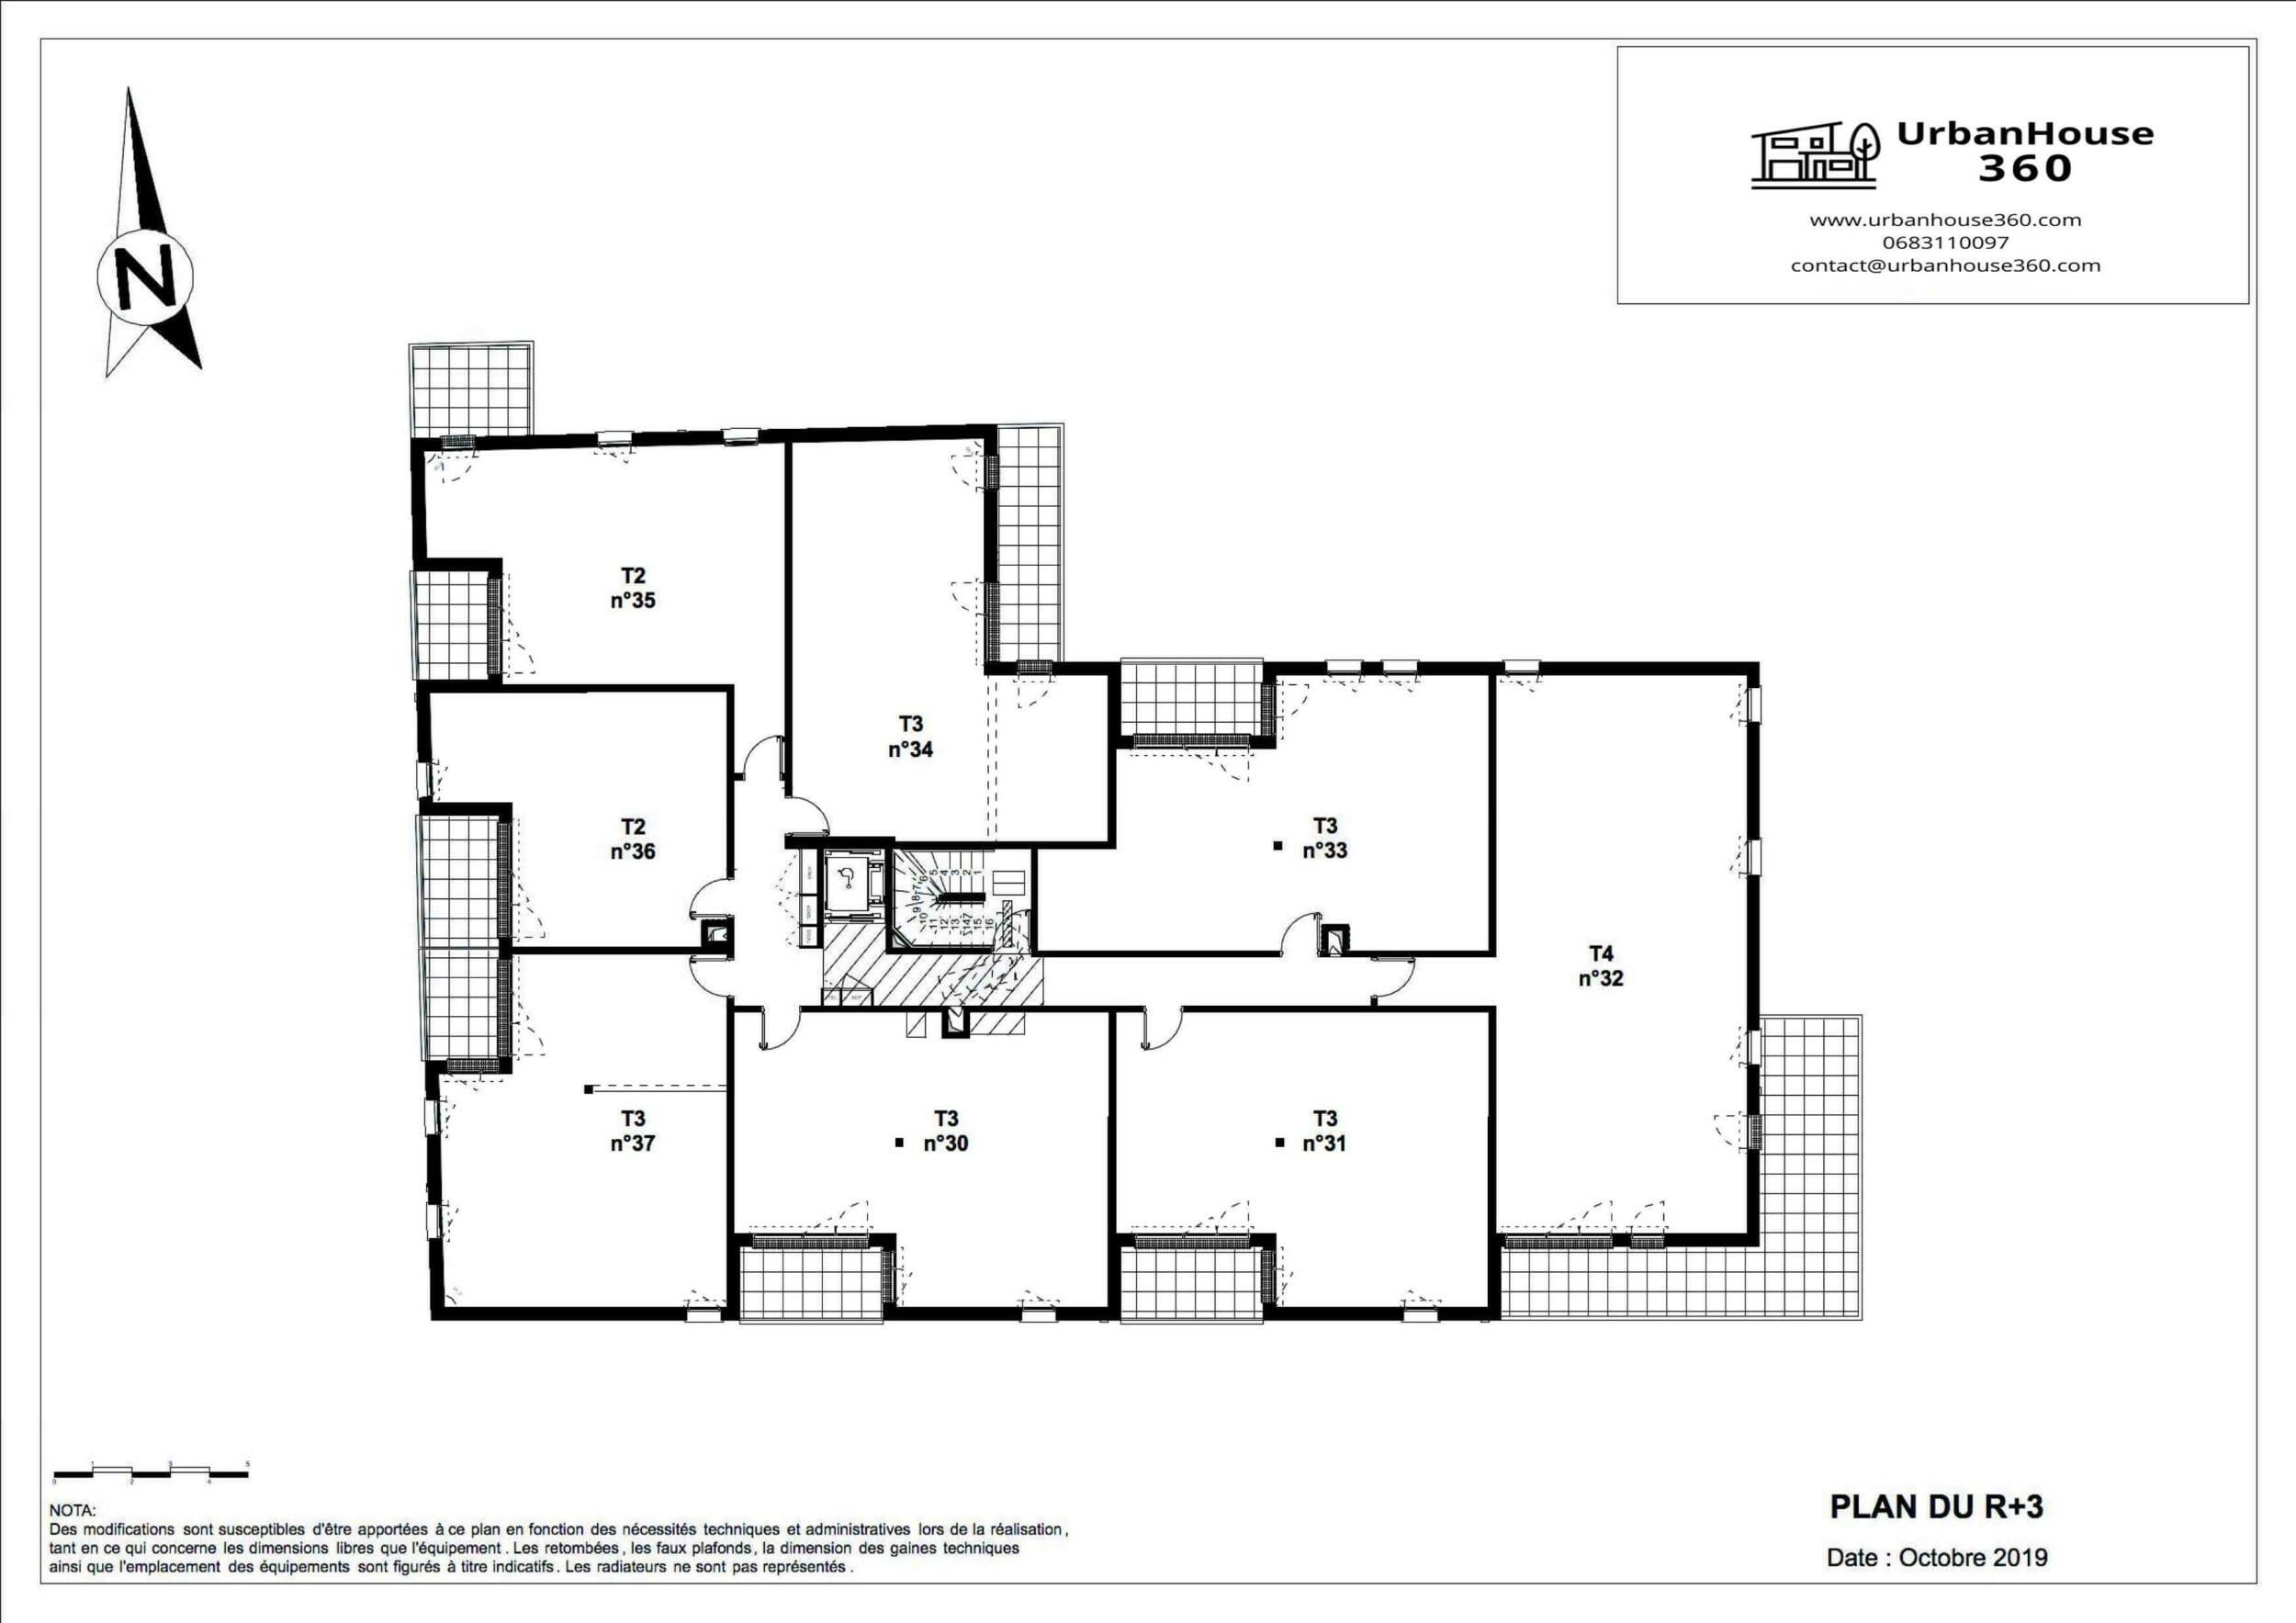 Urbanhouse360-Symphonie-Plan-T3-R+3